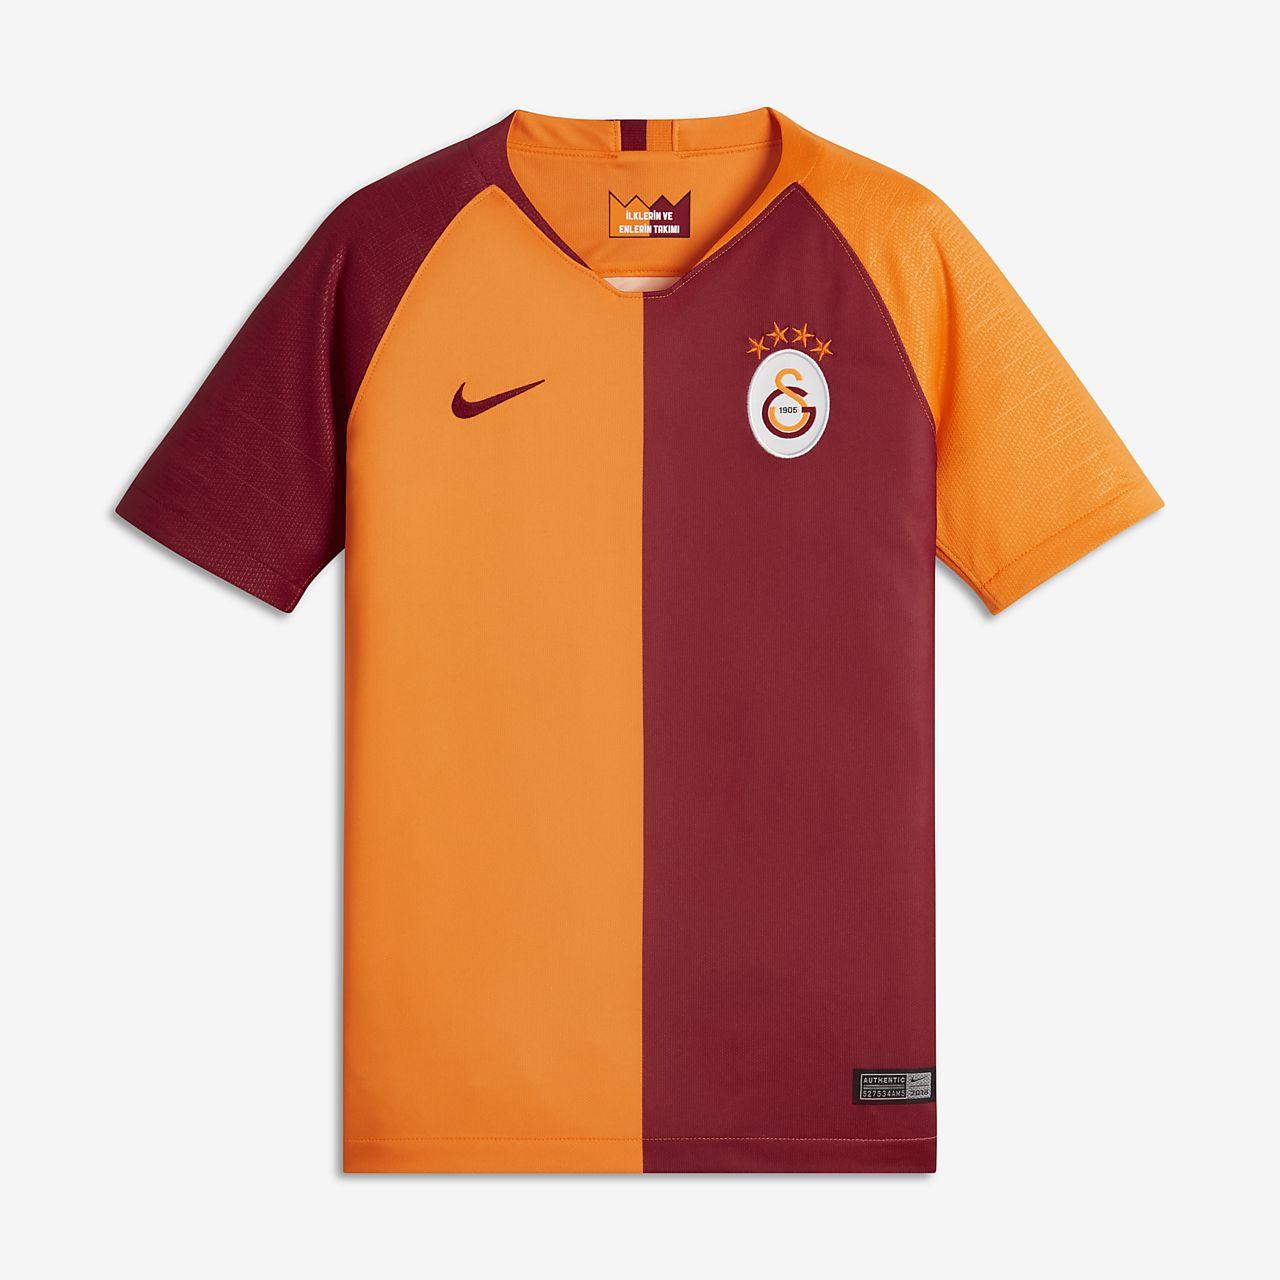 a04dbeb9245b8 2018 19 Galatasaray S.K. Stadium Home Camiseta de fútbol - Niño a ...